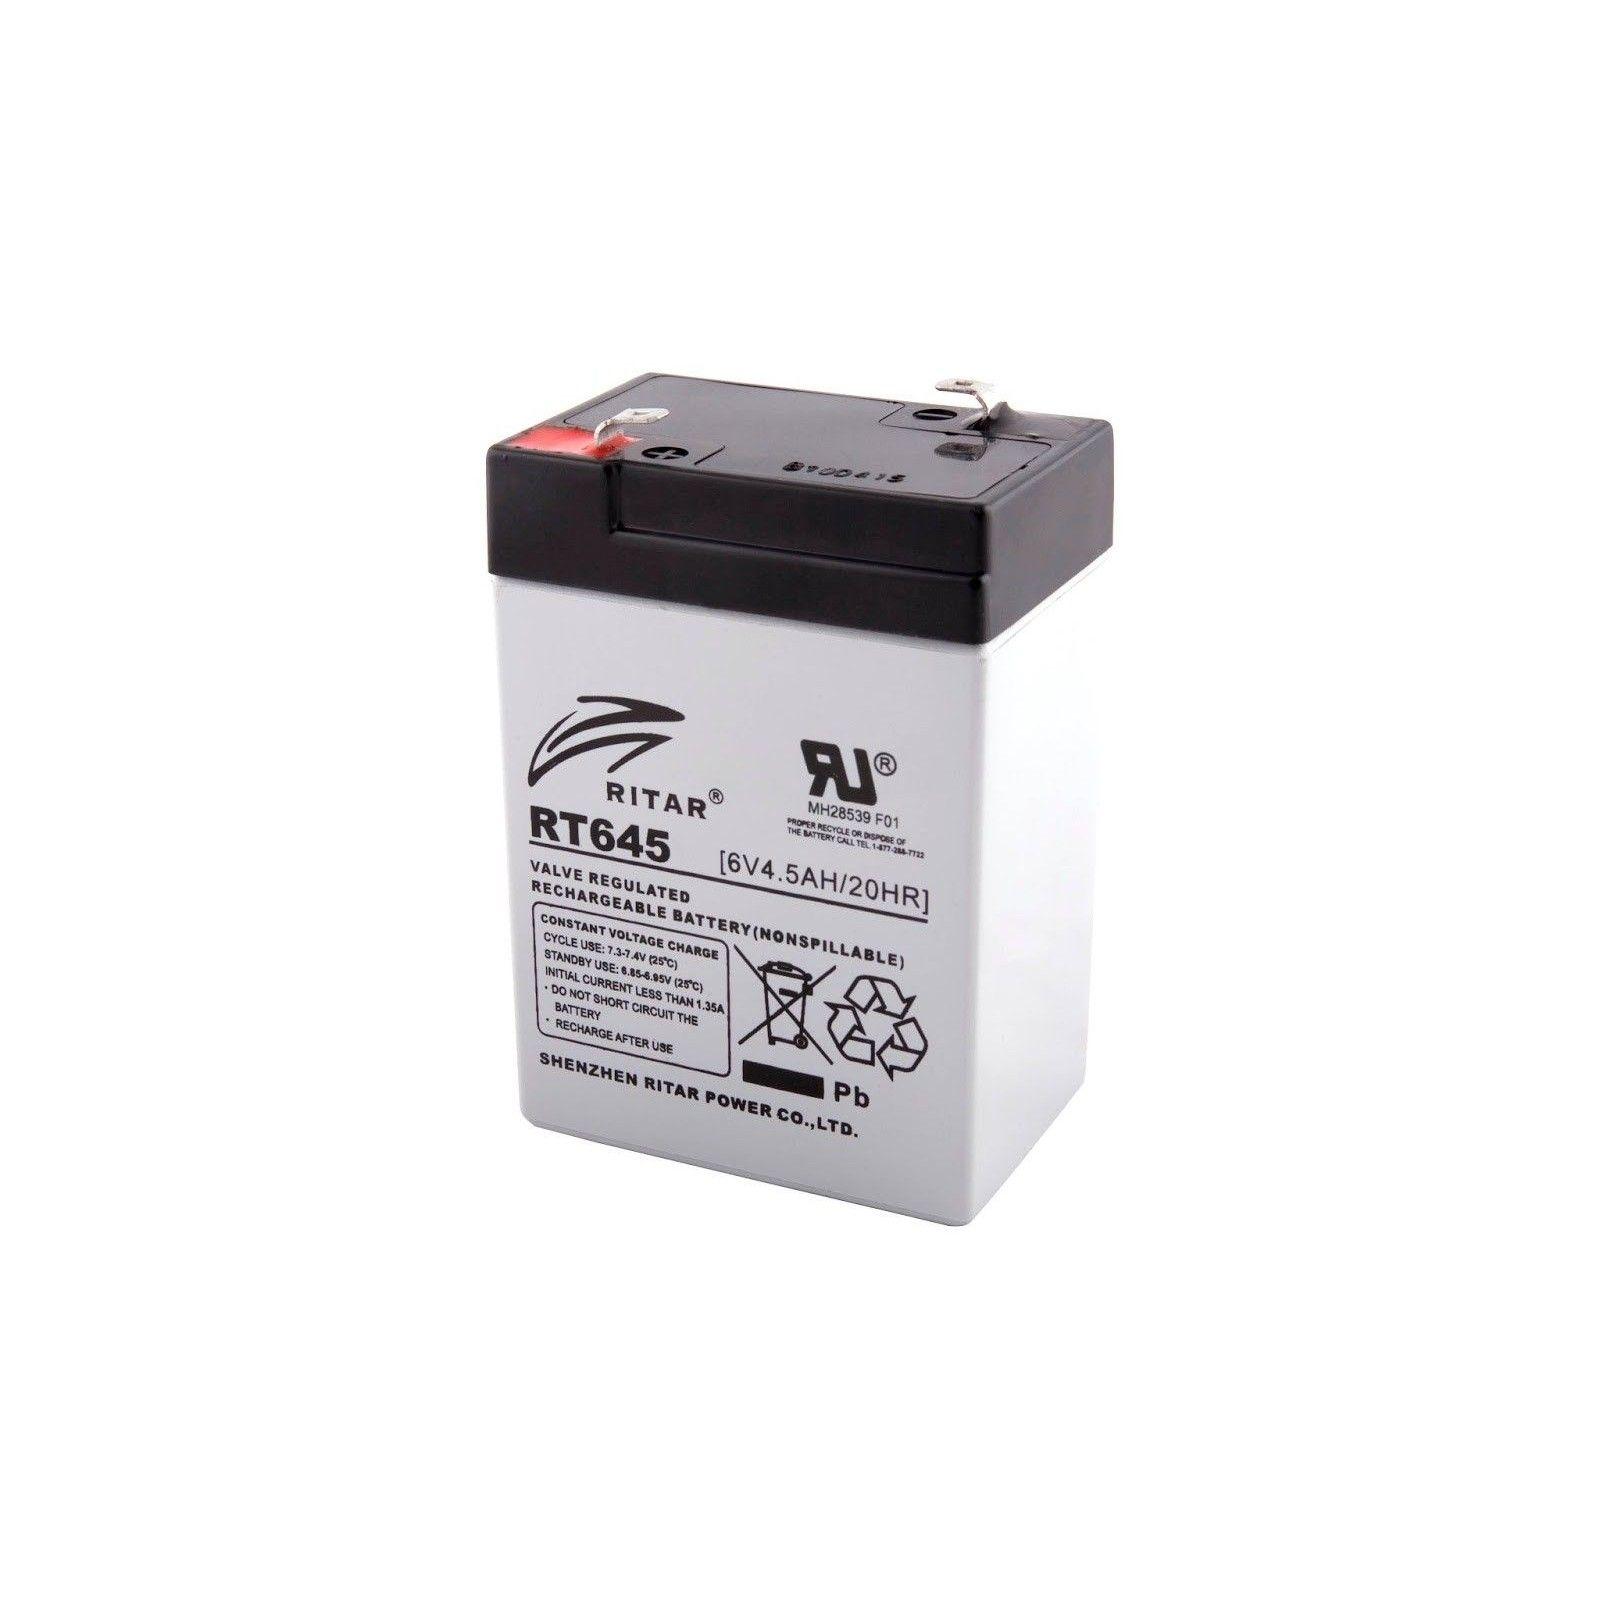 BATERIA MK POWERED AGM ES1.9-12 12V 2,3AH  - 1